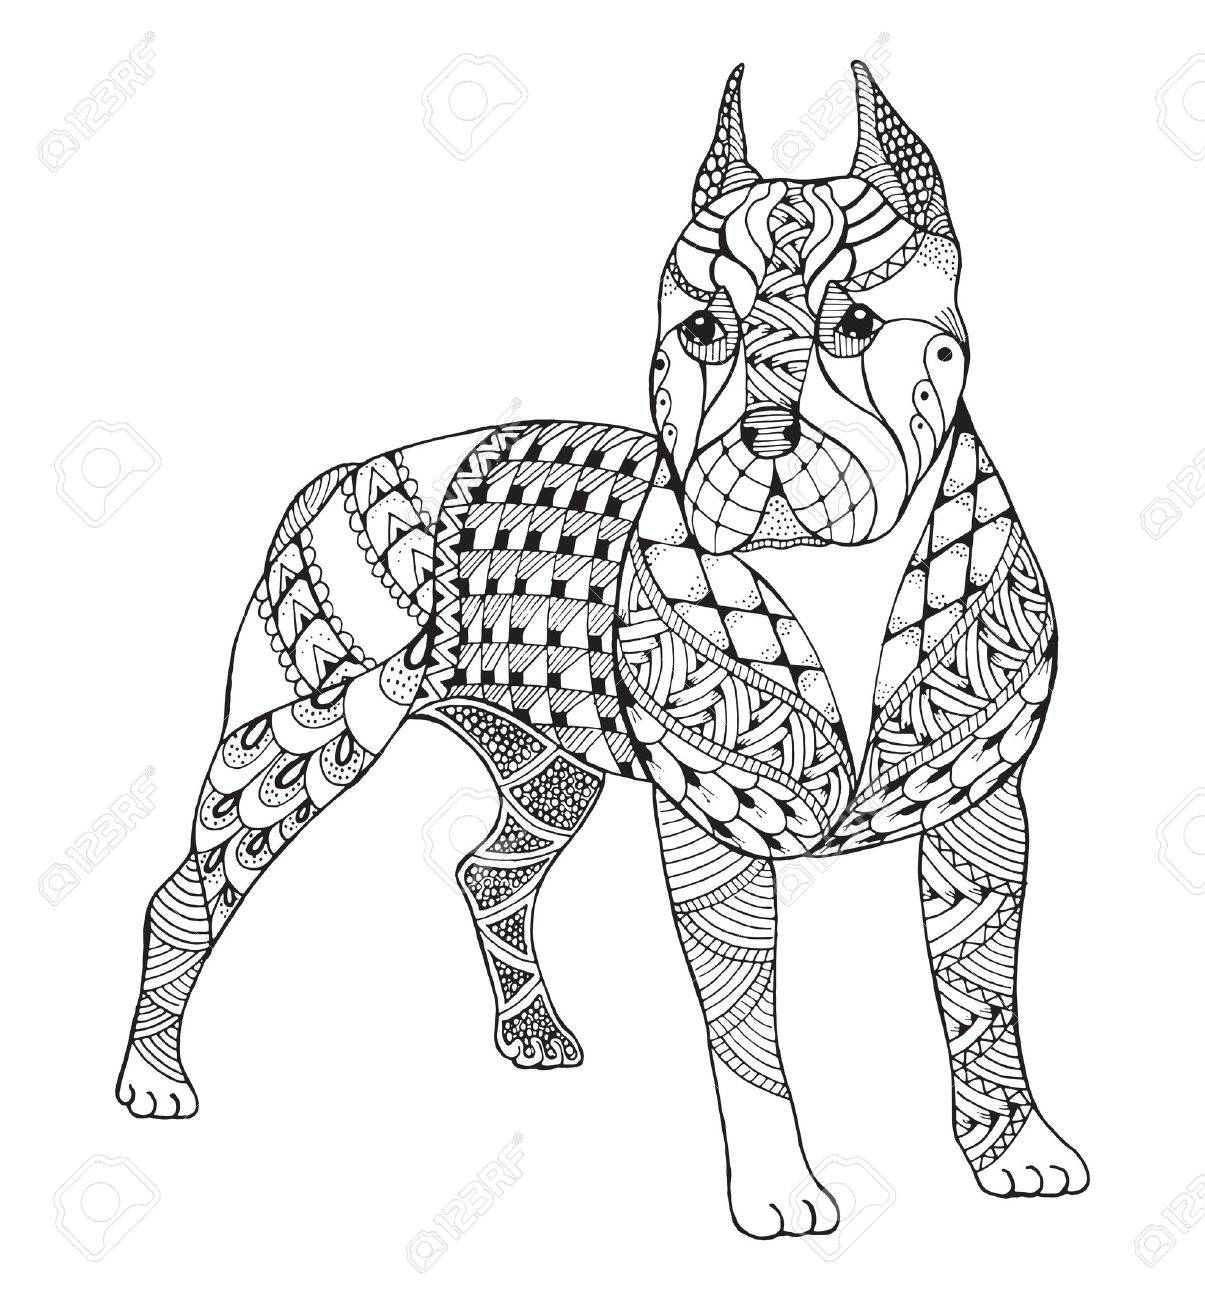 1205x1300 Pit Bull Terrier Zentangle Stylized, Vector, Illustration